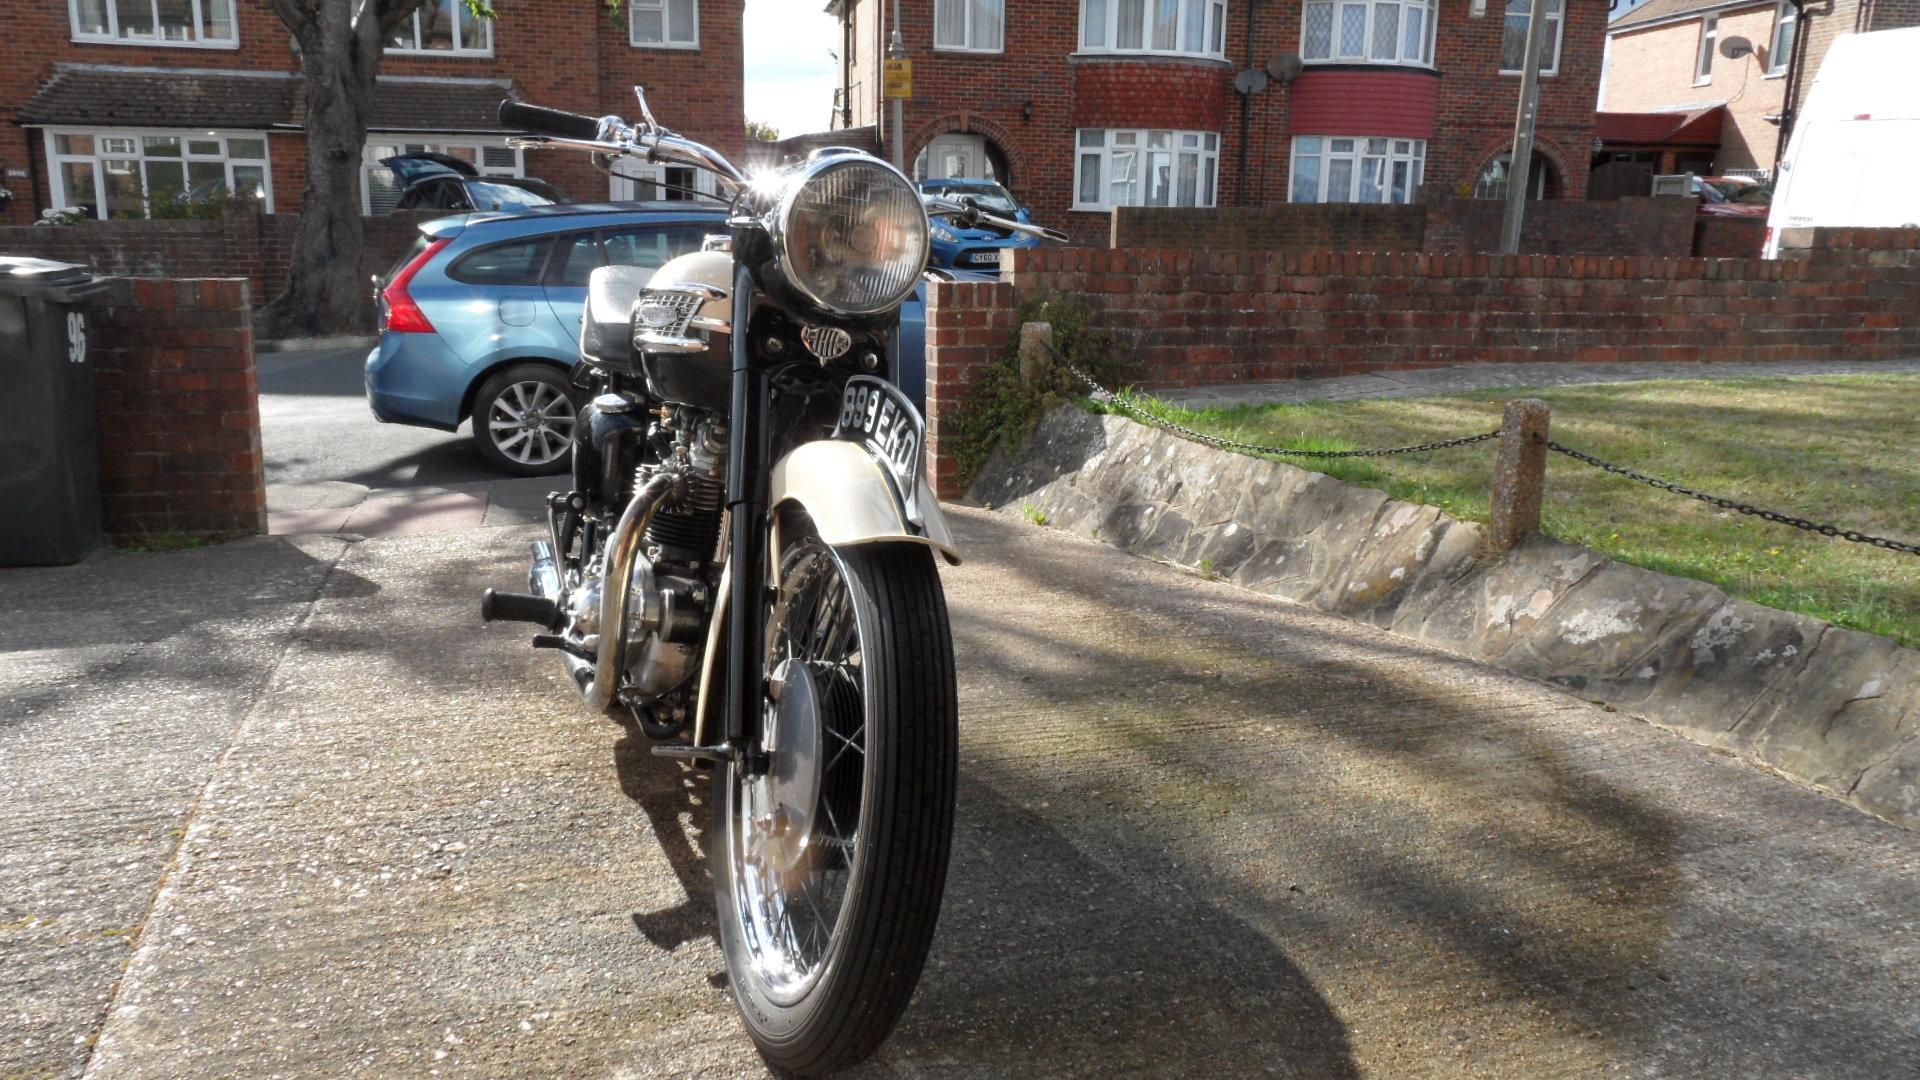 1959 Triumph Tiger T110 For Sale (picture 4 of 4)